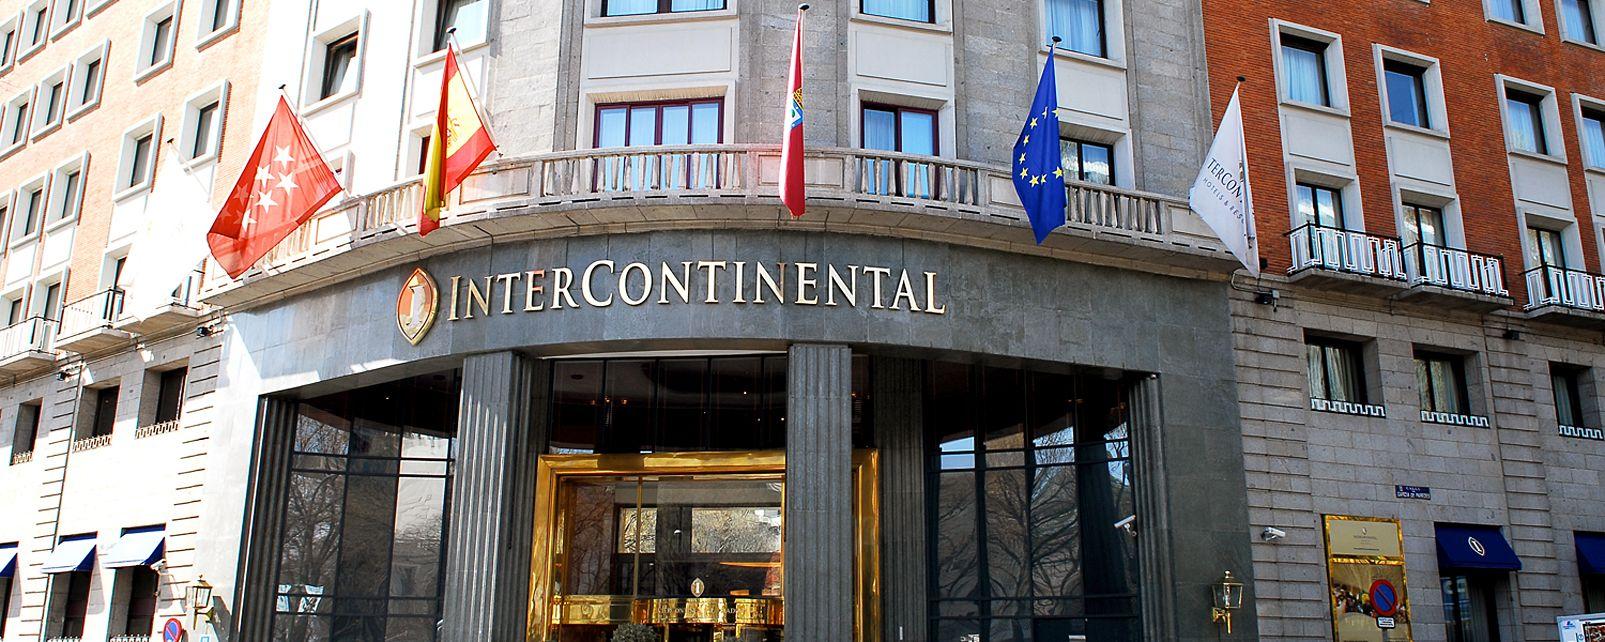 Hotel castellana intercontinental madrid - Hoteles de diseno en espana ...